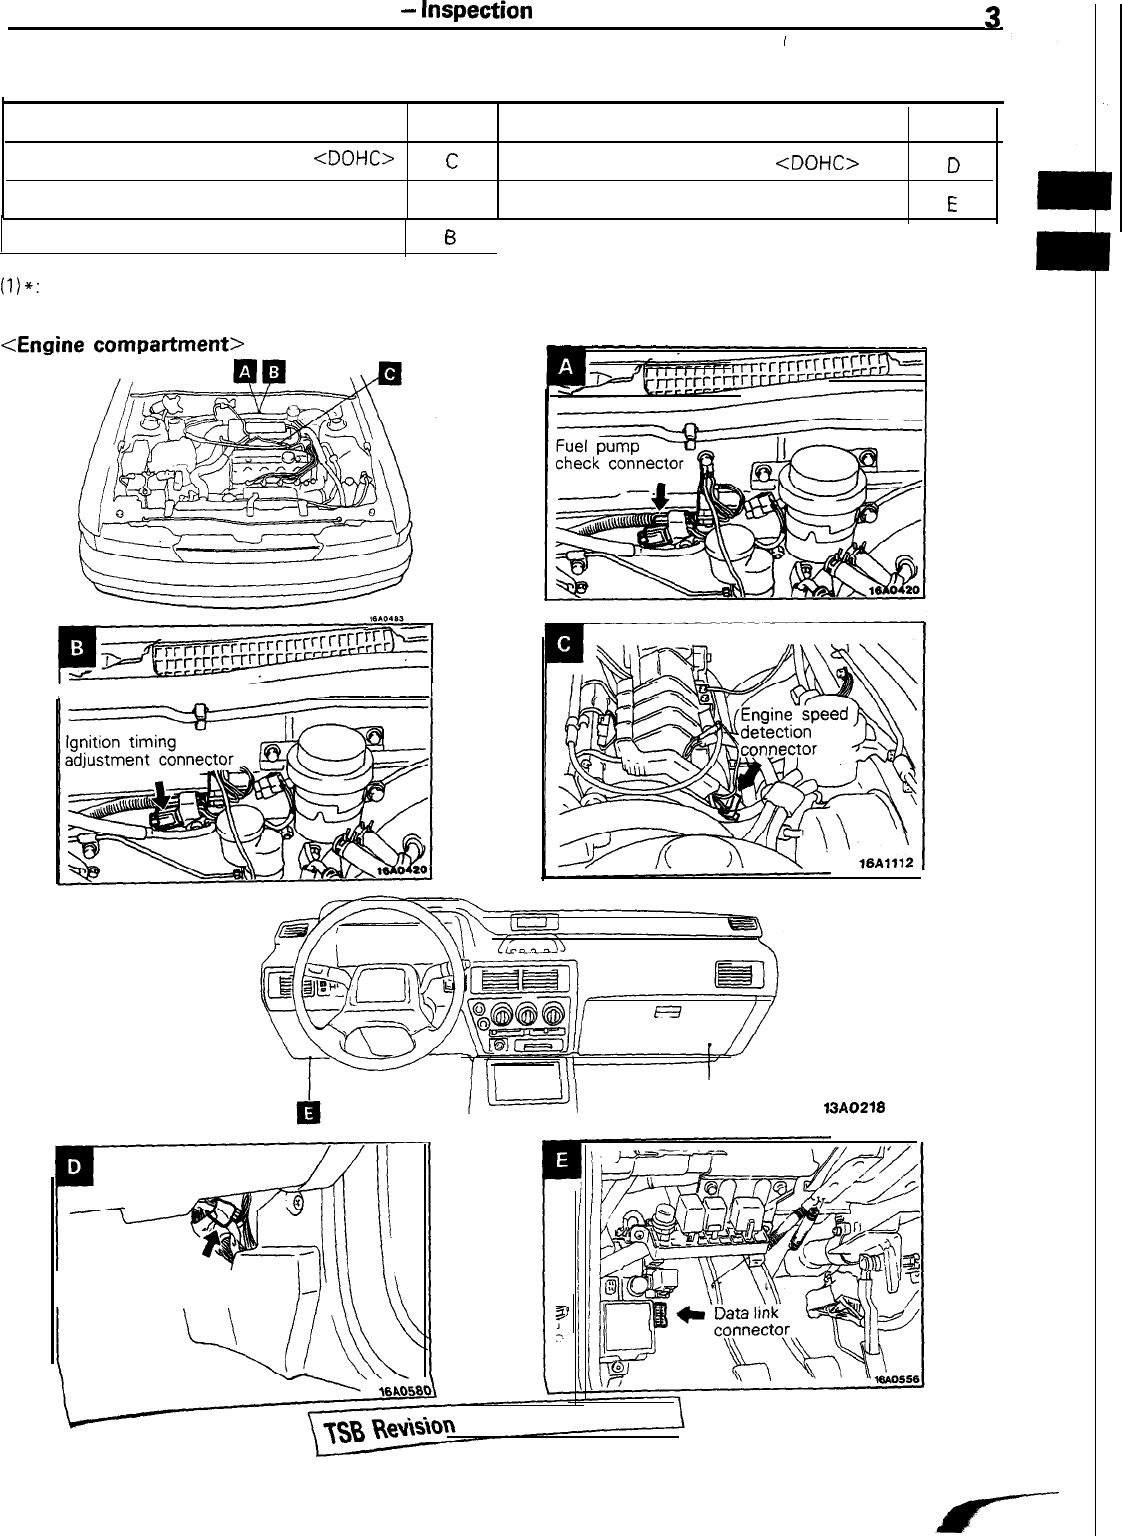 1993 Mitsubishi Galant Part Diagram Ask Answer Wiring 2001 Parts 1989 Workshop Manual 2 Pdf Cars Pinterest Rh Com 2003 Engine